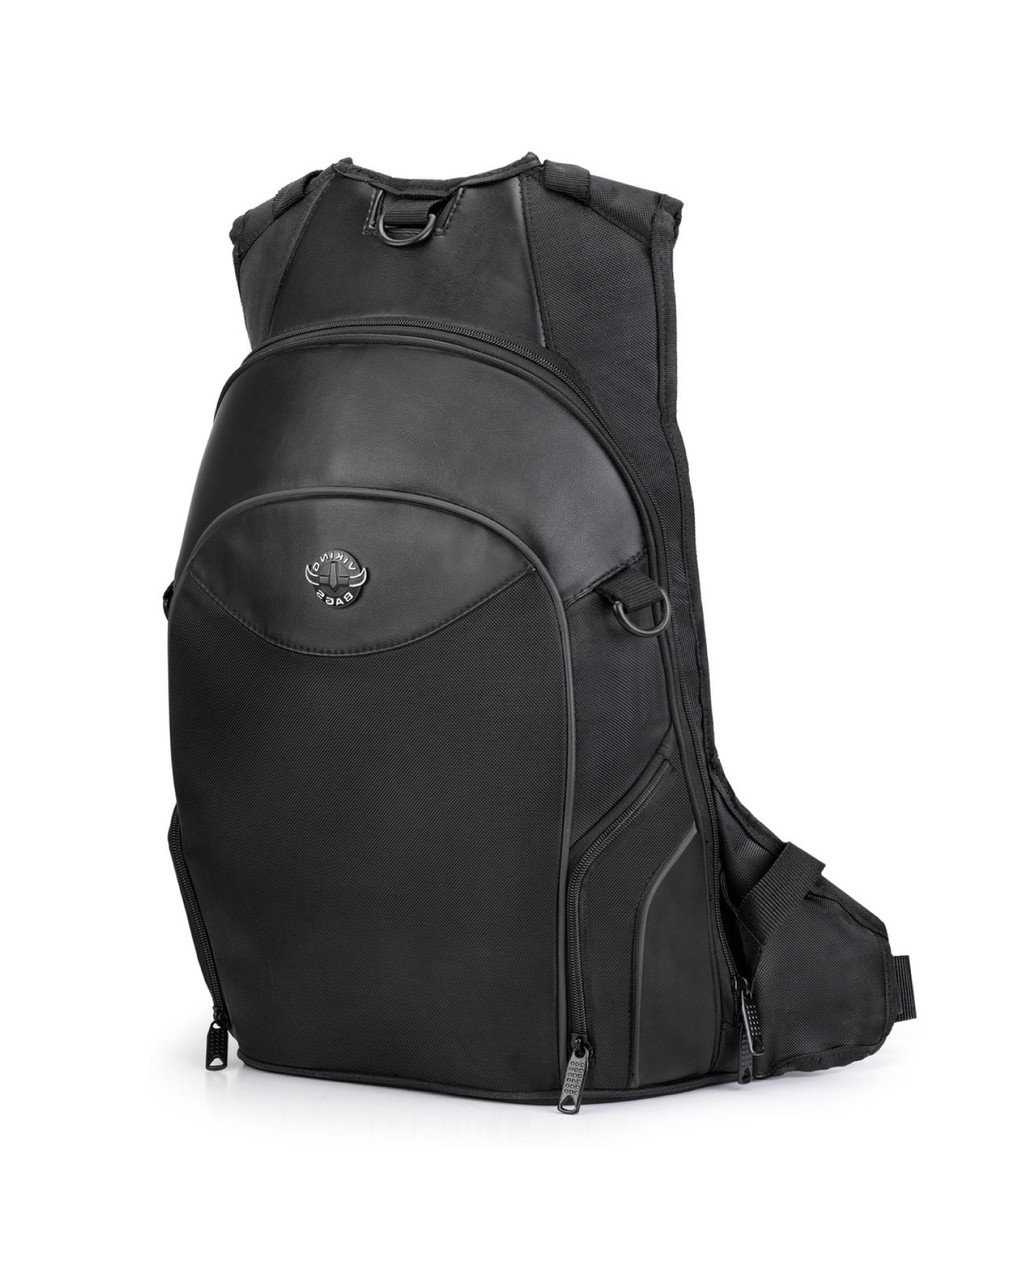 Triumph Viking Motorcycle Medium Backpack Main Bag View